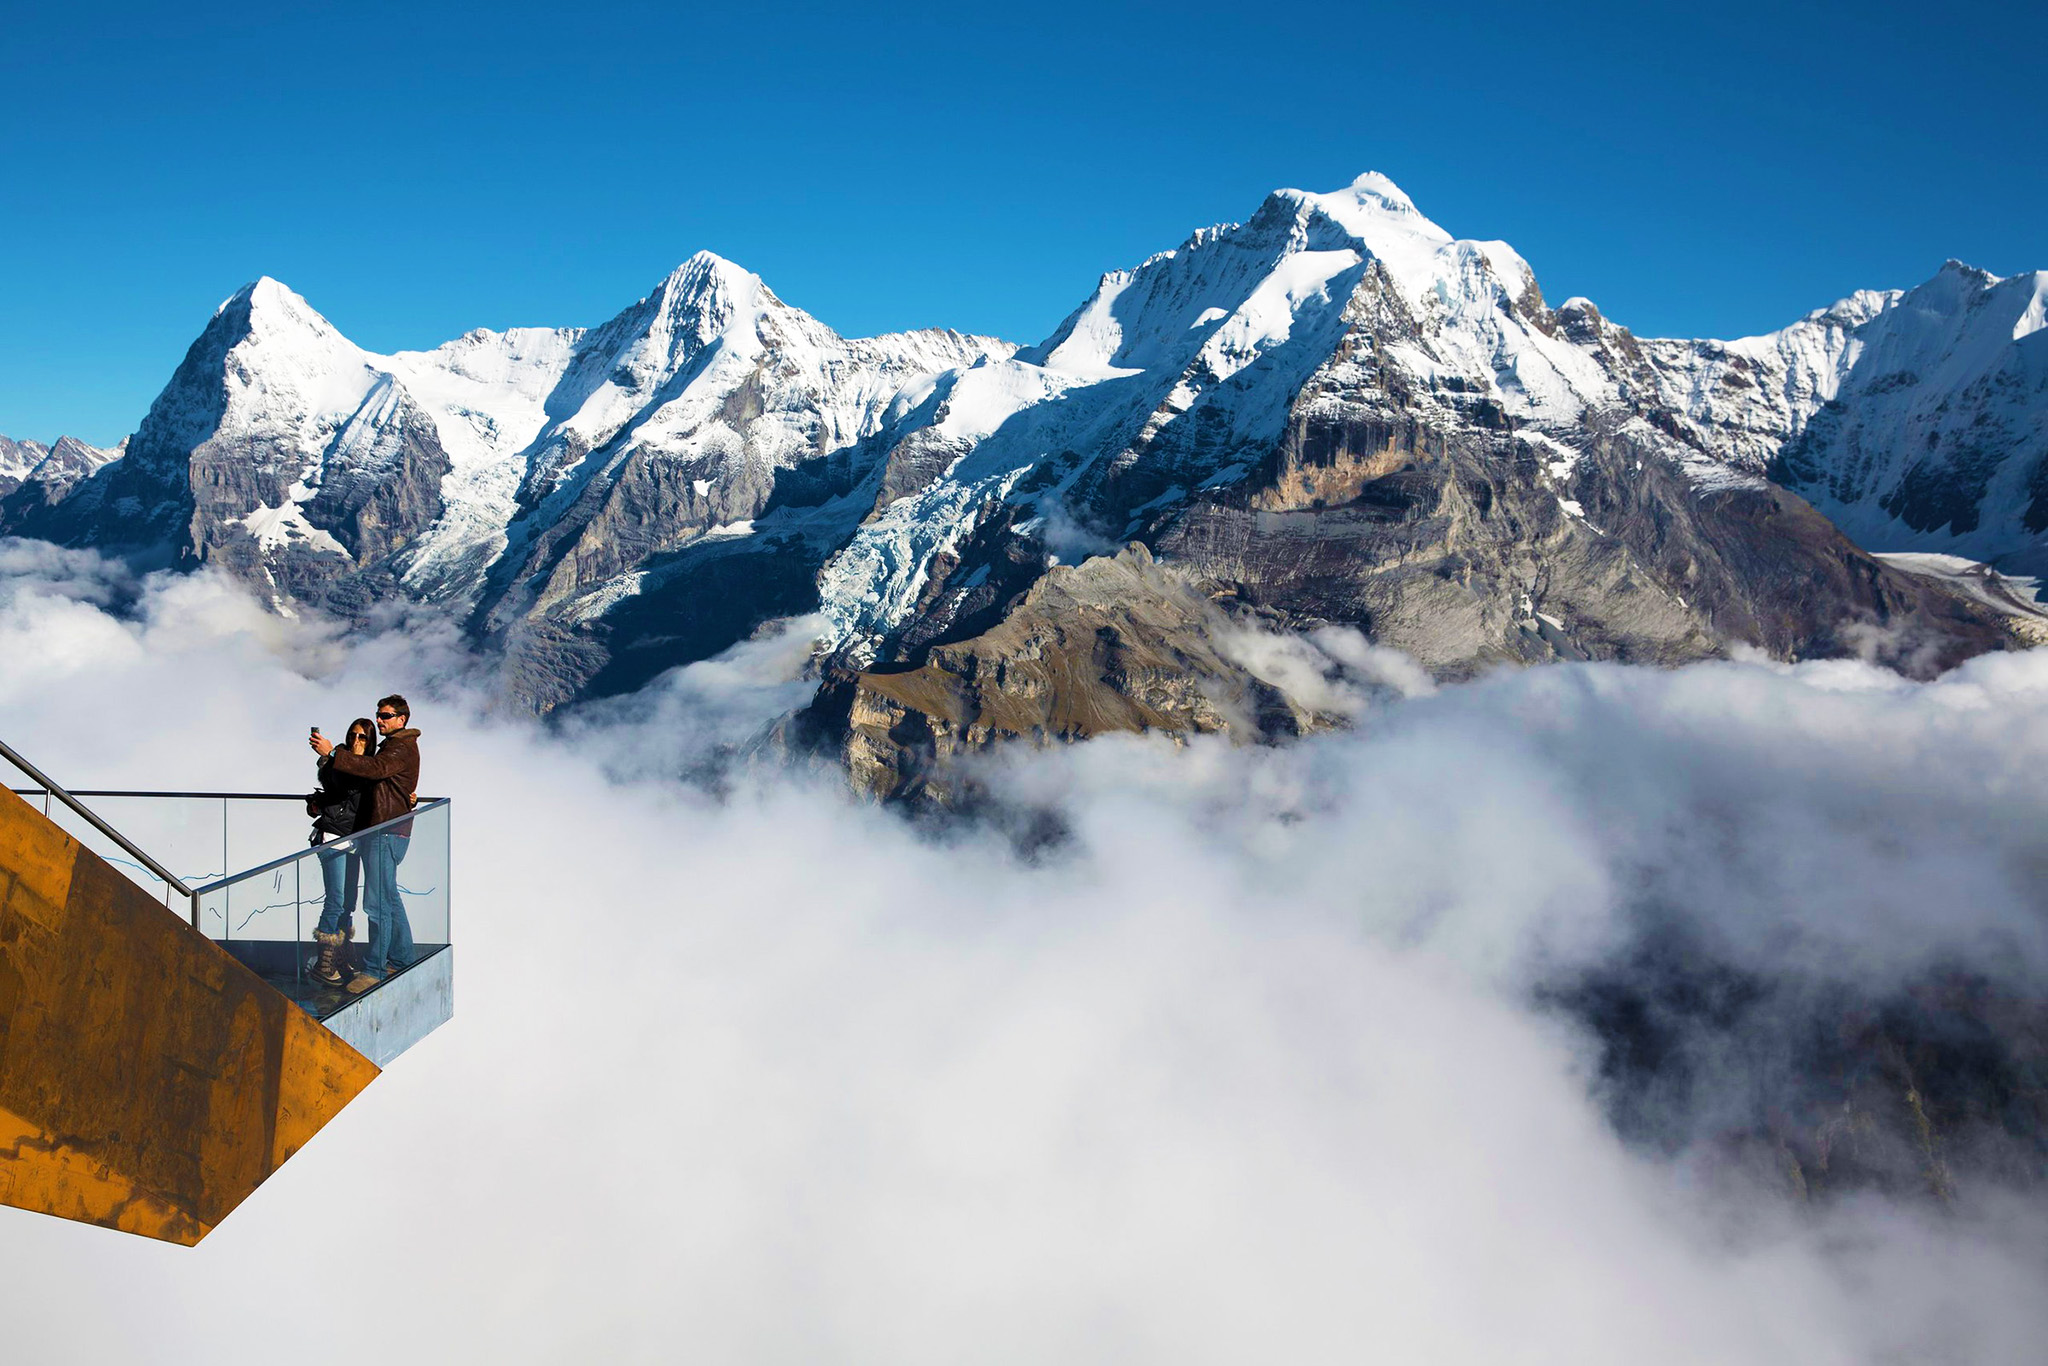 kt_2020_360_Keytours_excursions_Swisstours_interlaken_jungfraujoch4_2048_10